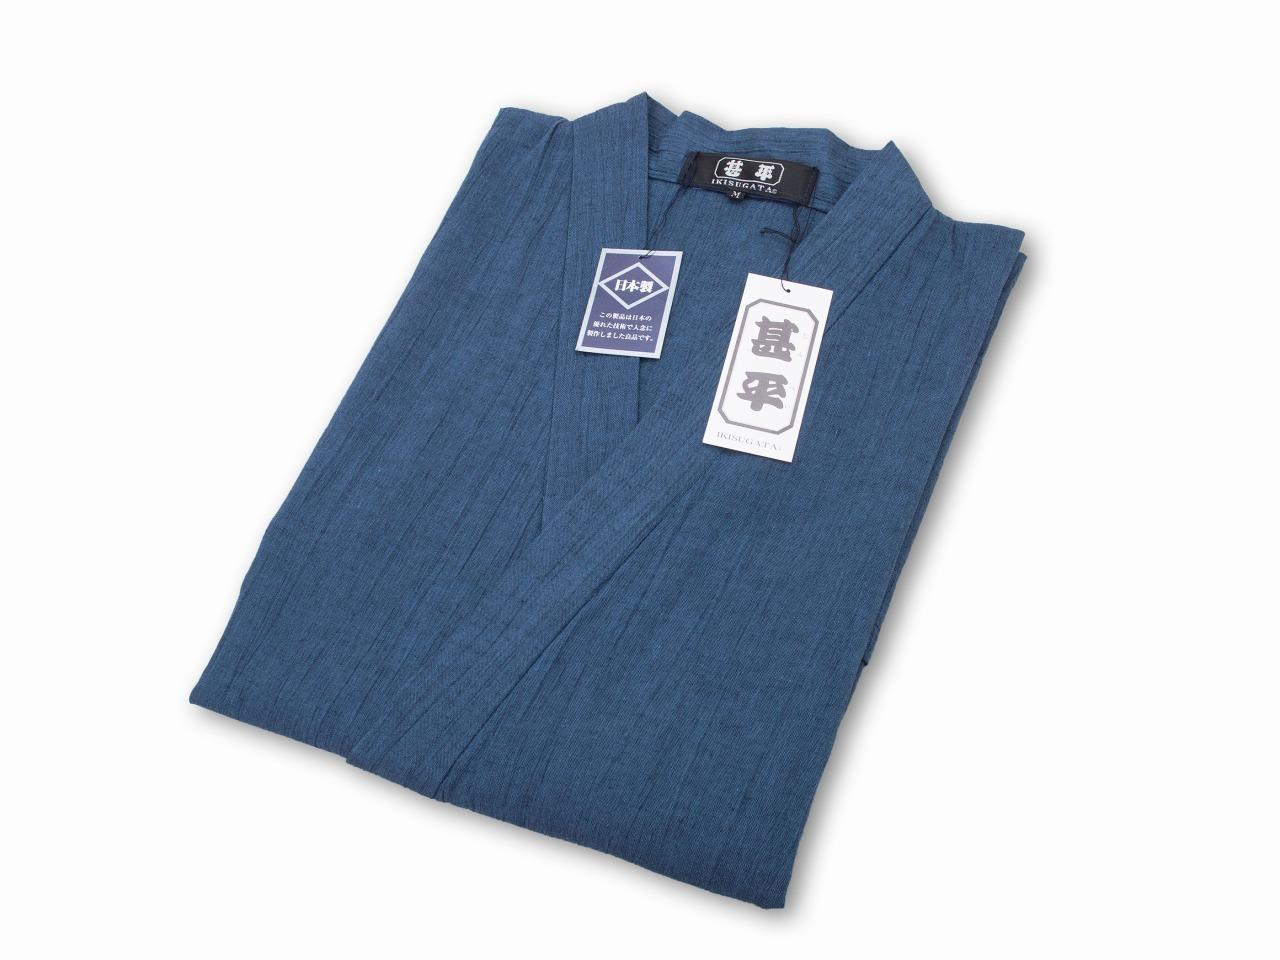 綿麻楊柳甚平(日本製) 中紺 畳み